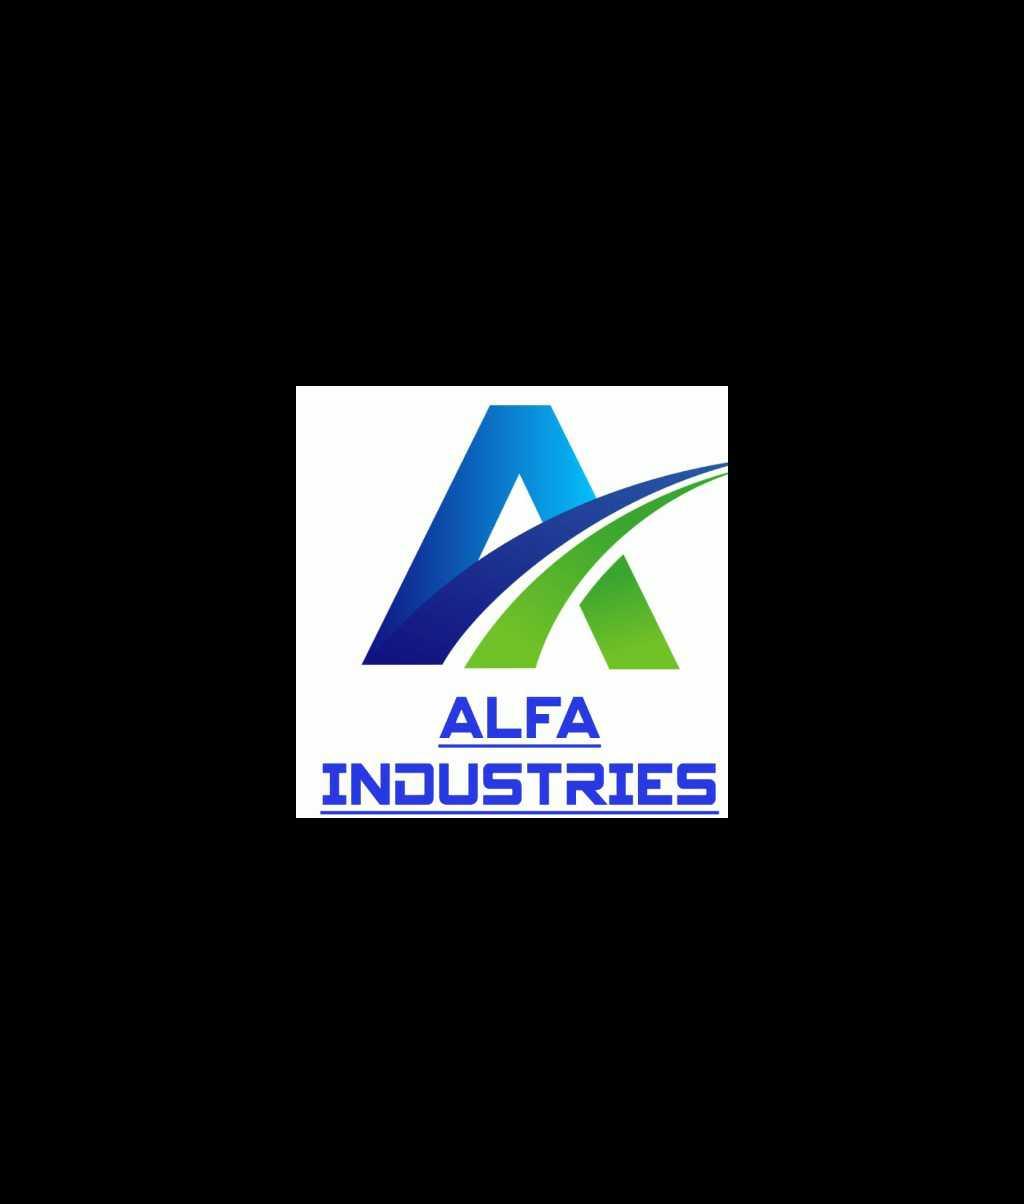 ALFA INDUSTRIES